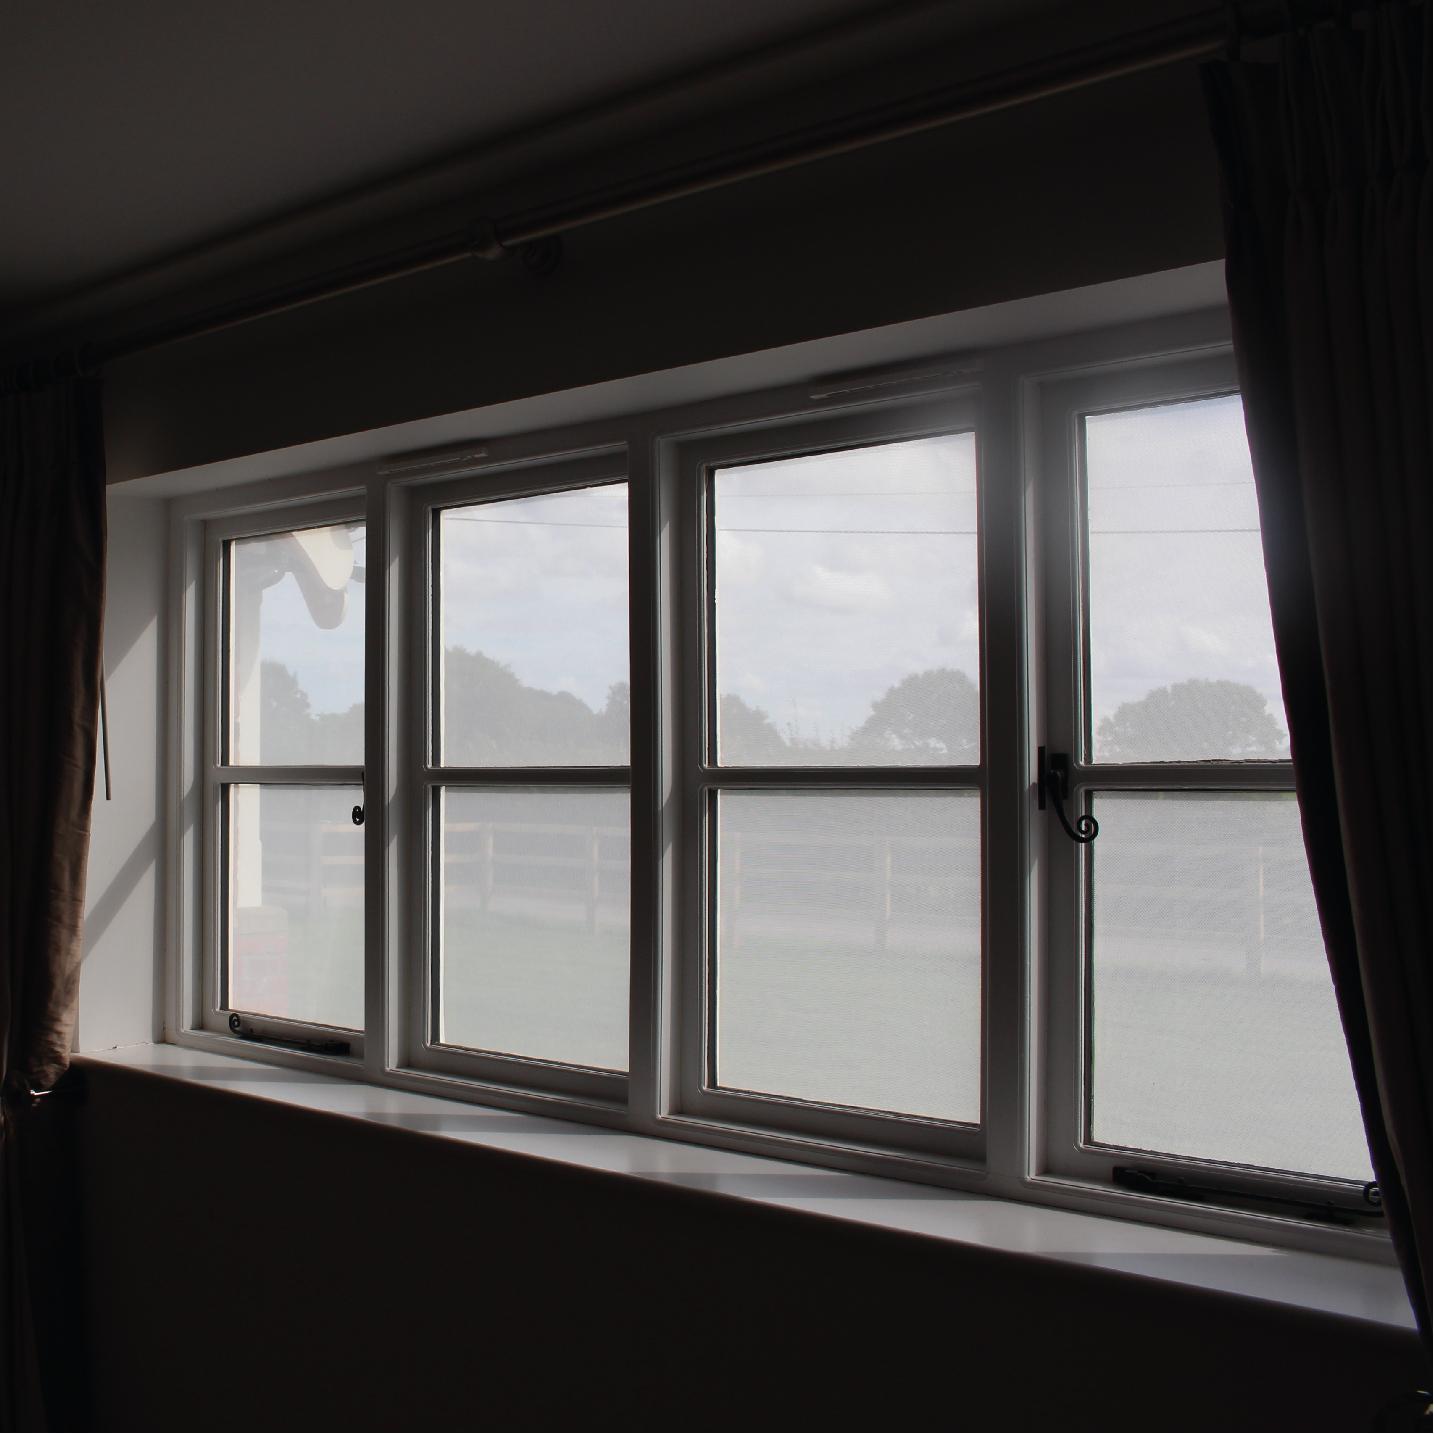 White On Black Nighttime Privacy Window Film 01